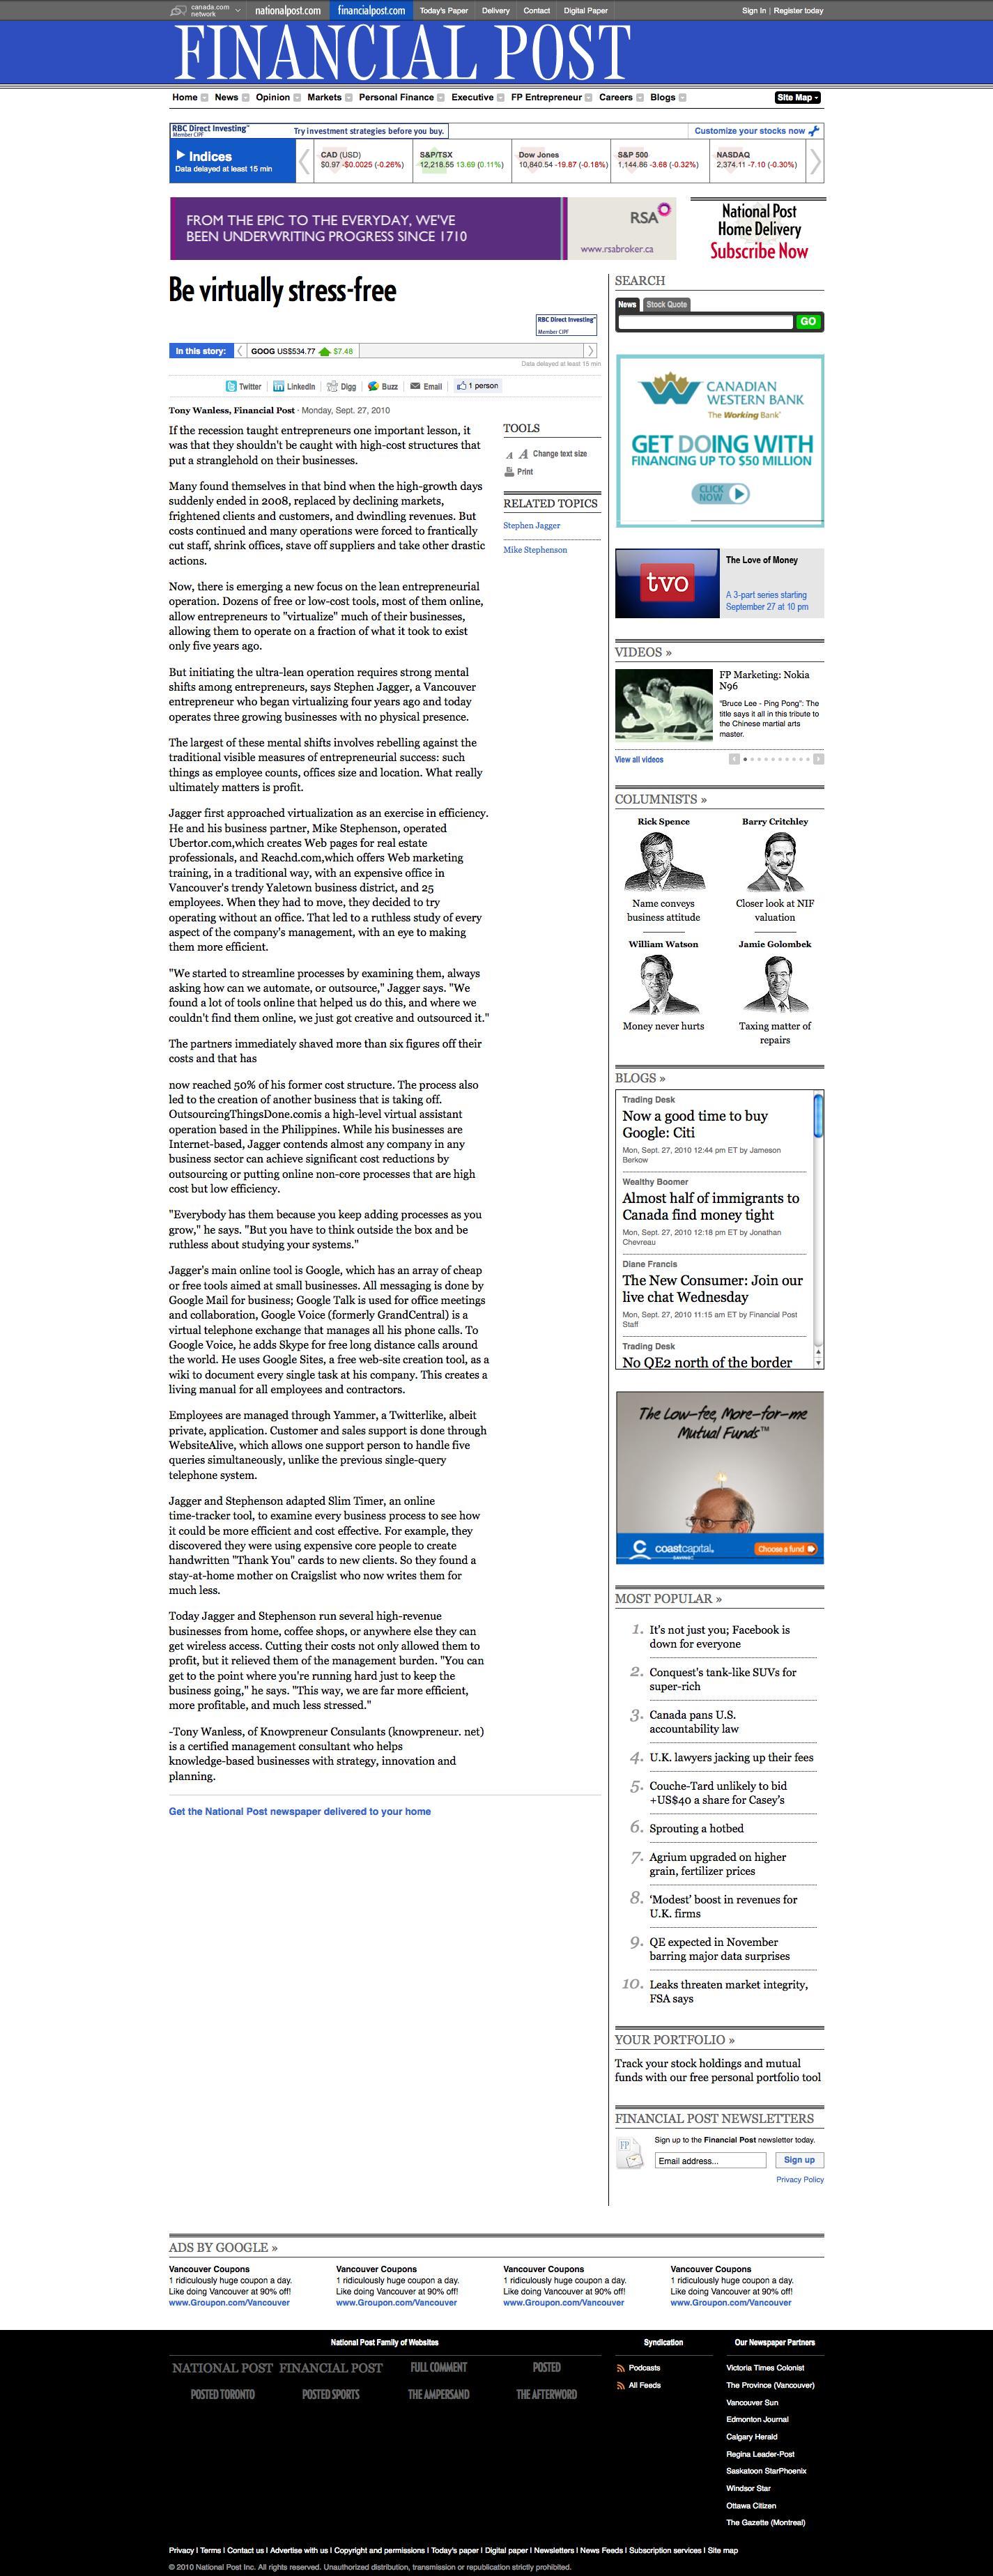 financialpost.com article about virtual business